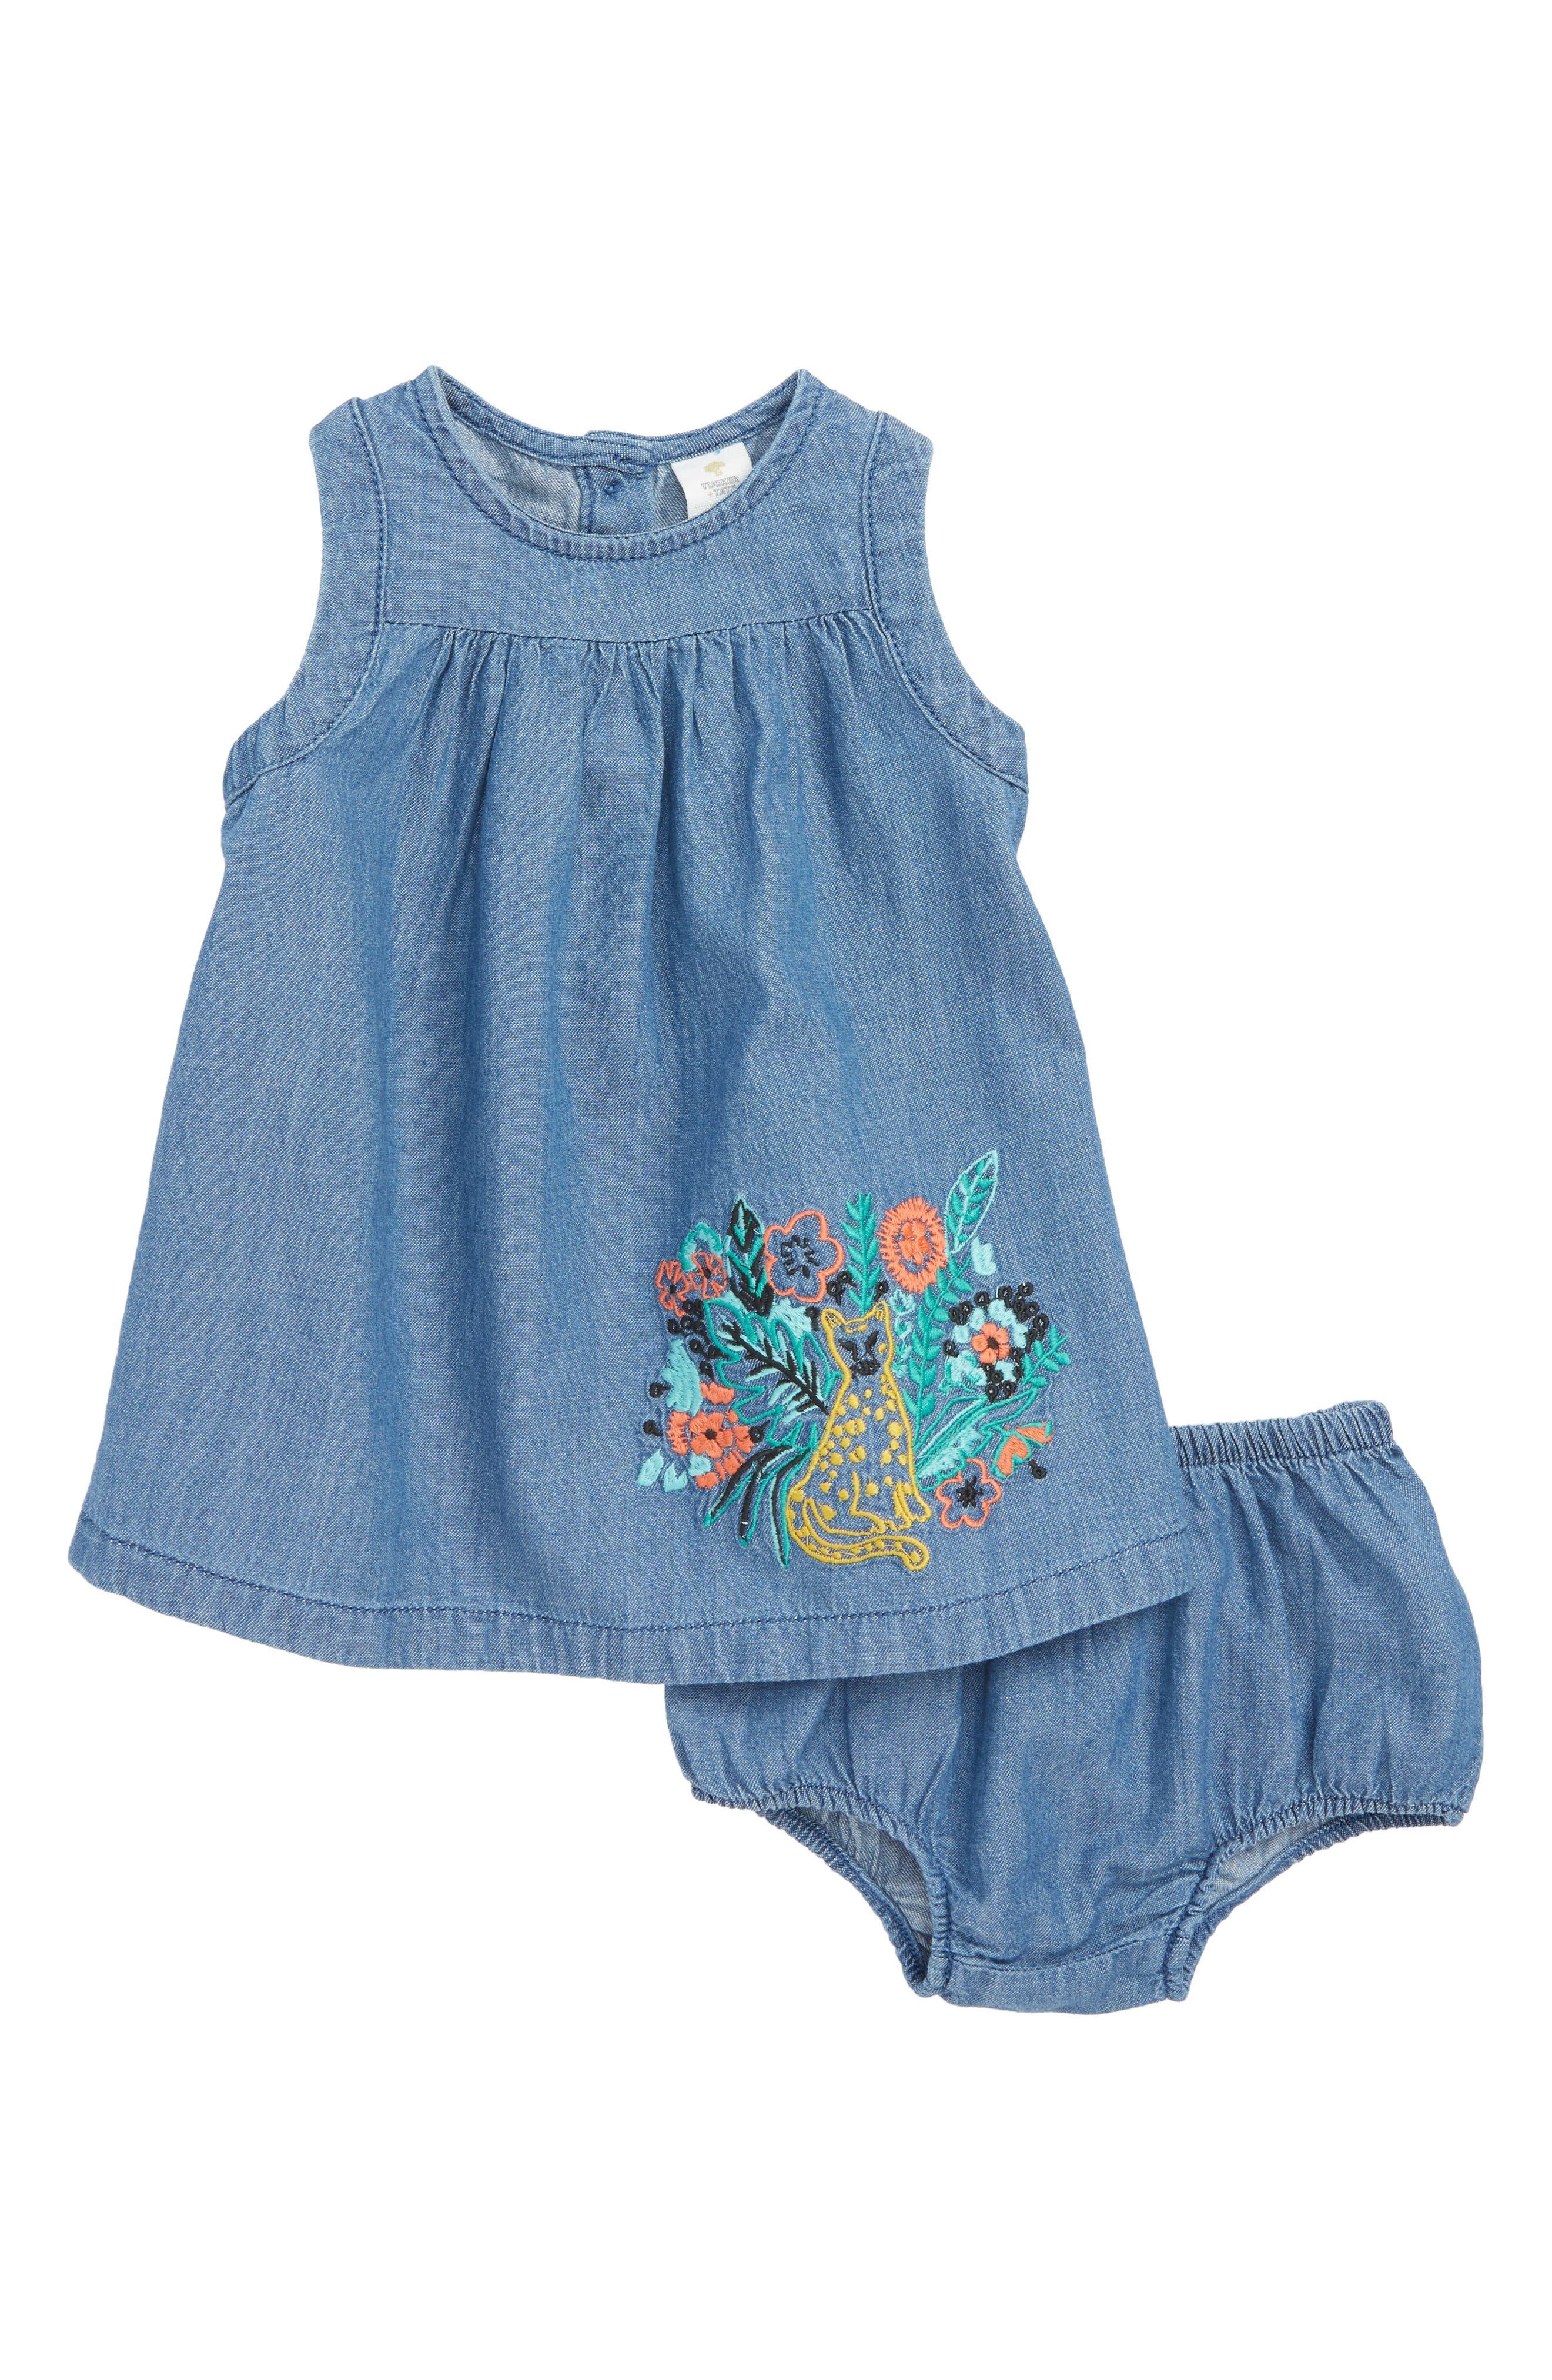 Embroidered Chambray Dress,                             Main thumbnail 1, color,                             420